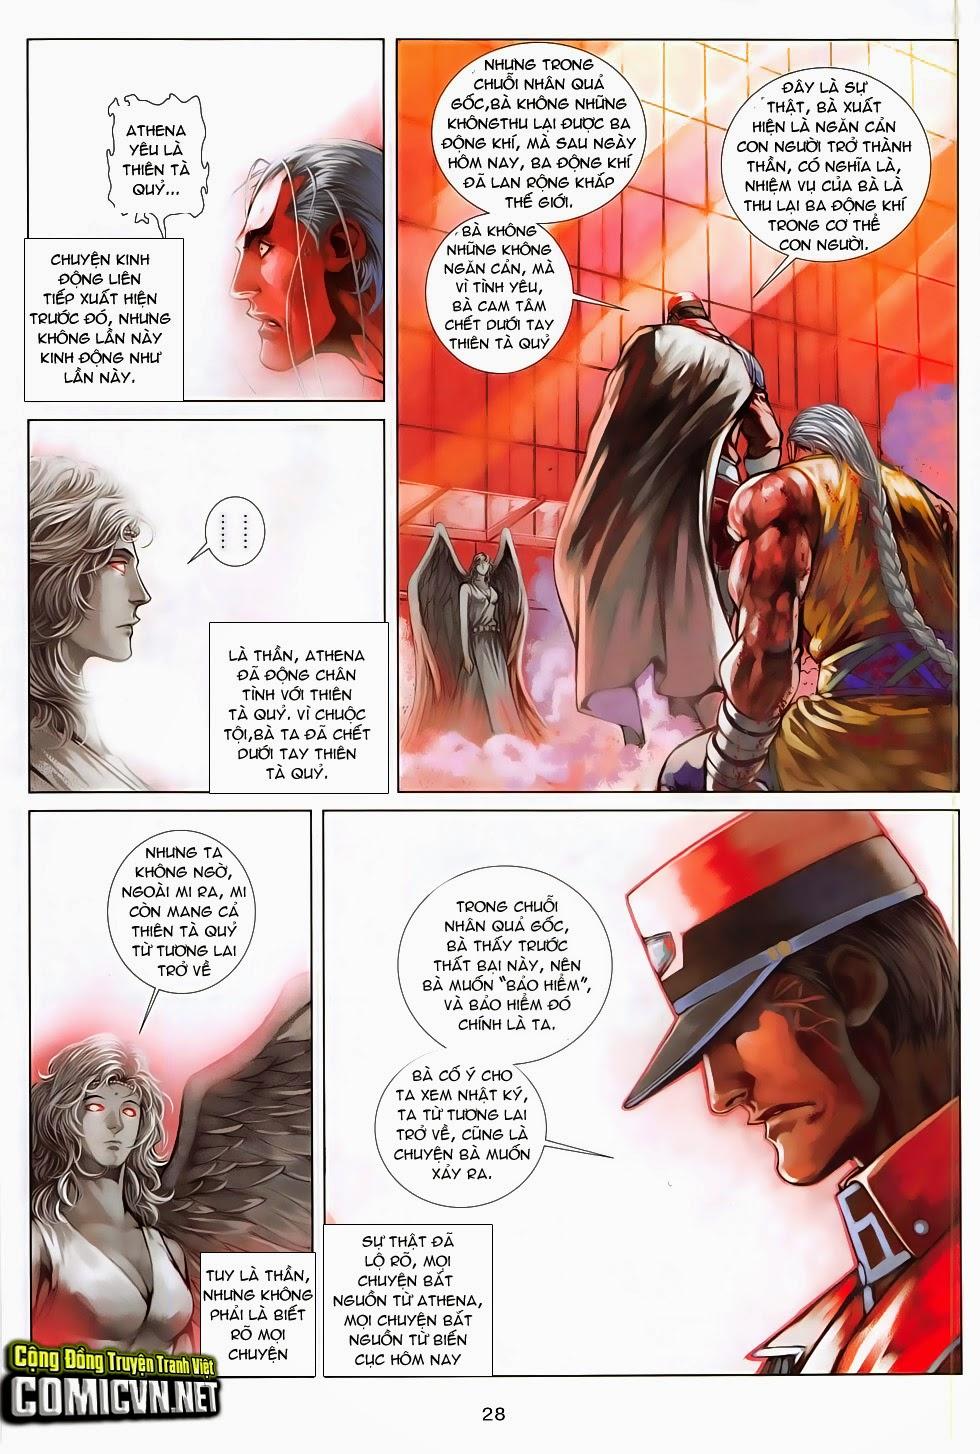 Ba Động Quyền Z Hadouken Zero chap 15 - Trang 28